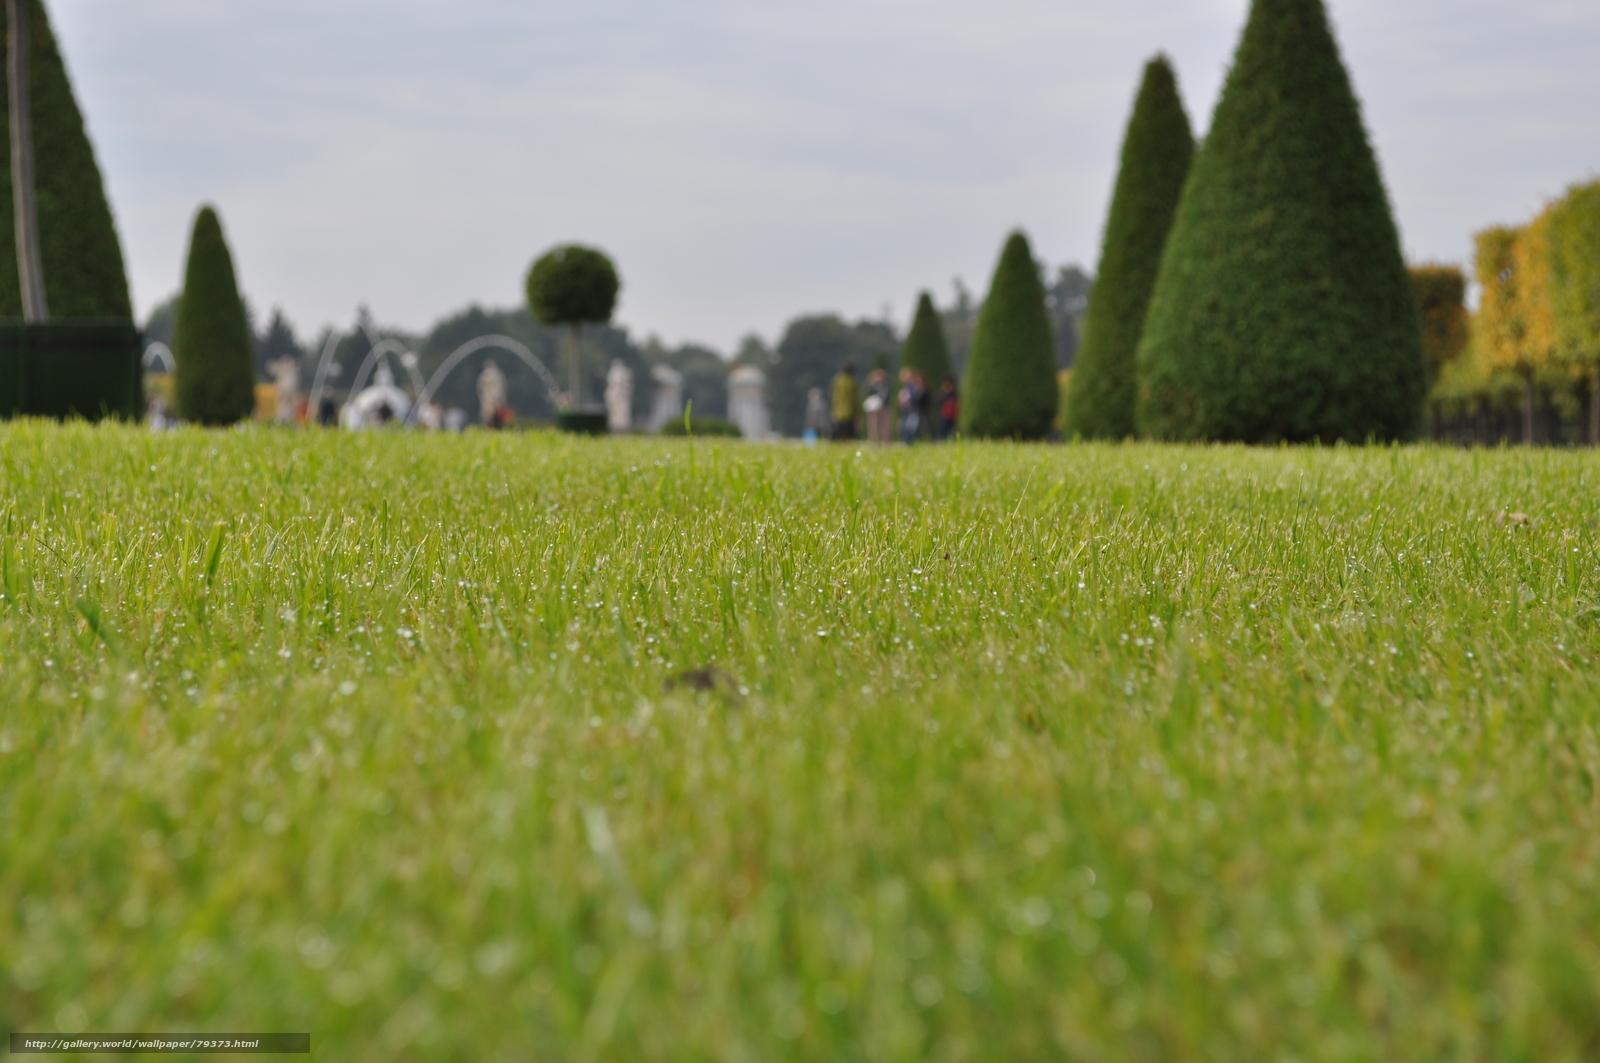 Download Wallpaper Grass Park Lawn Free Desktop Wallpaper In The Resolution 4288x2848 Picture 79373